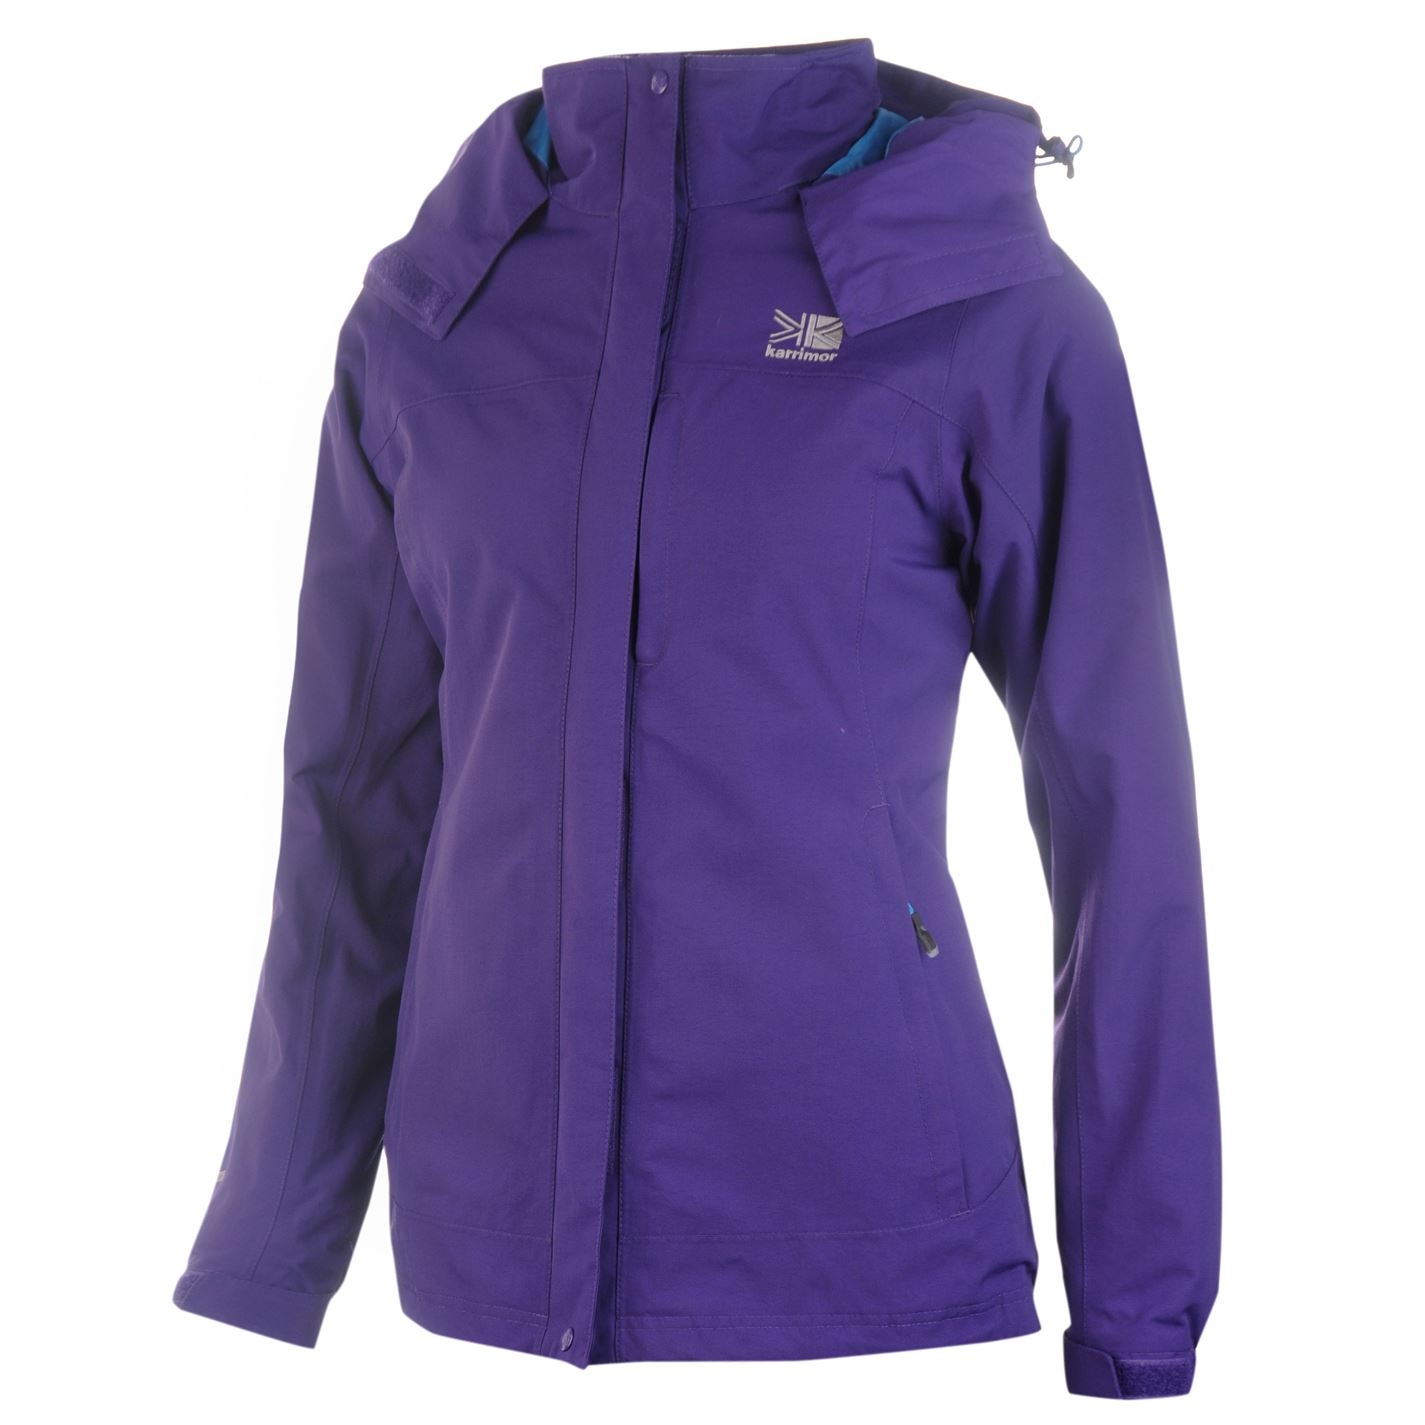 29341e09d65e Karrimor-3in1-Jacket-Hooded-Fleece-Outerwear-Womens-Ladies thumbnail